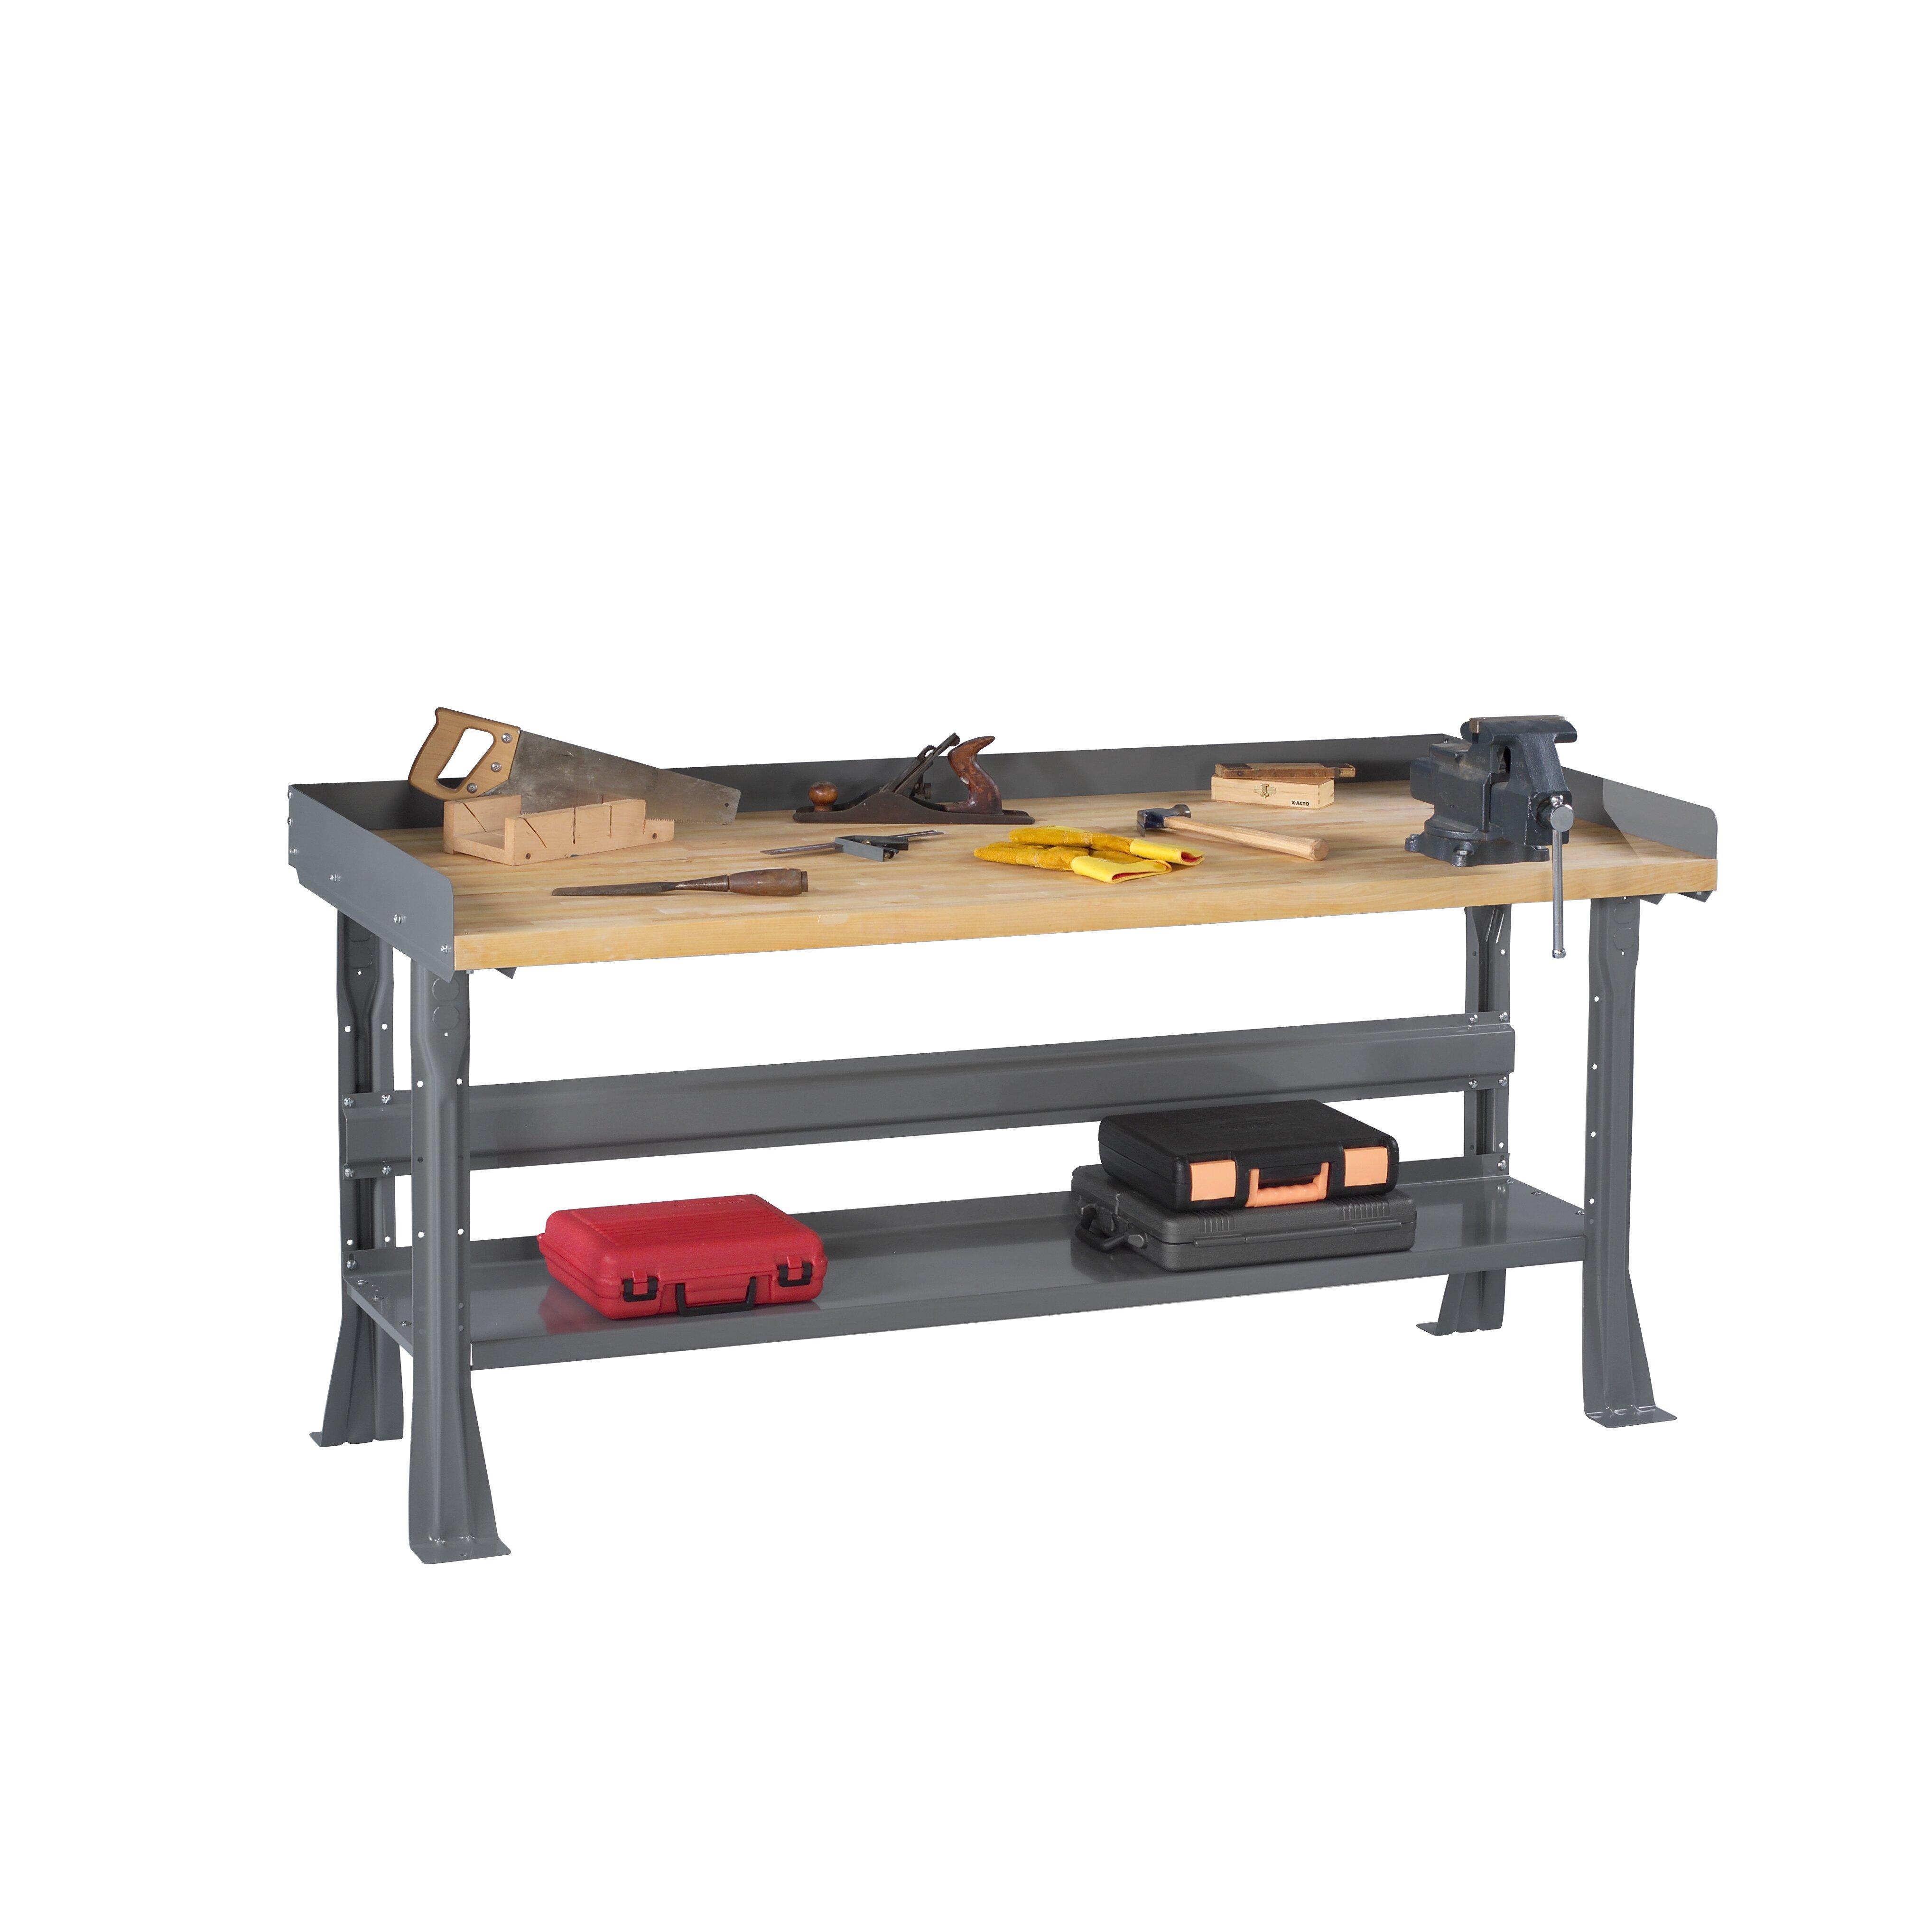 Laminated Maple Bench Top Maple Laminate Top Workbench Wayfair